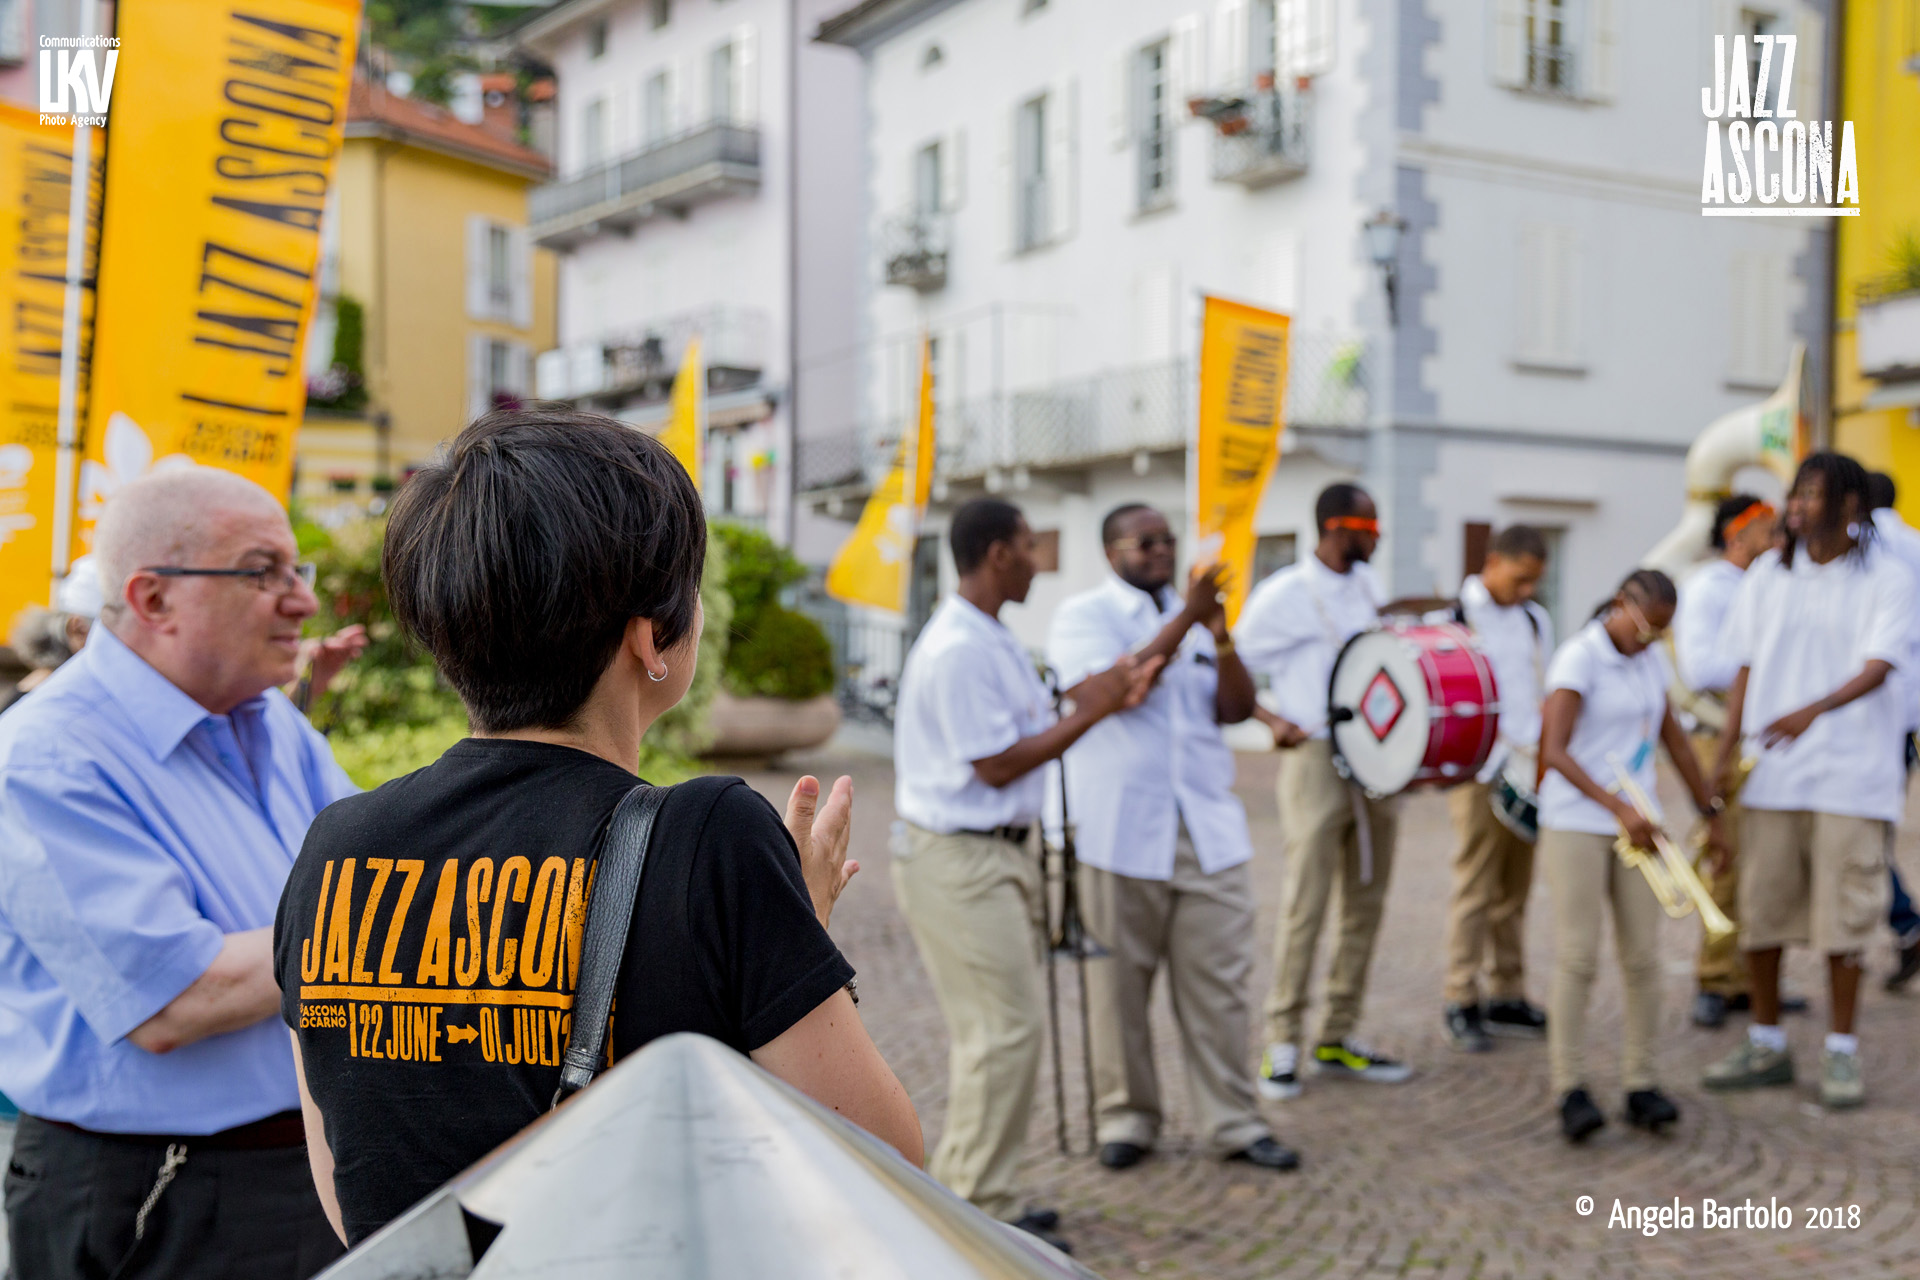 Angela Bartolo e Luca Vantusso</br>34° Jazzascona 2018</br>Reportage